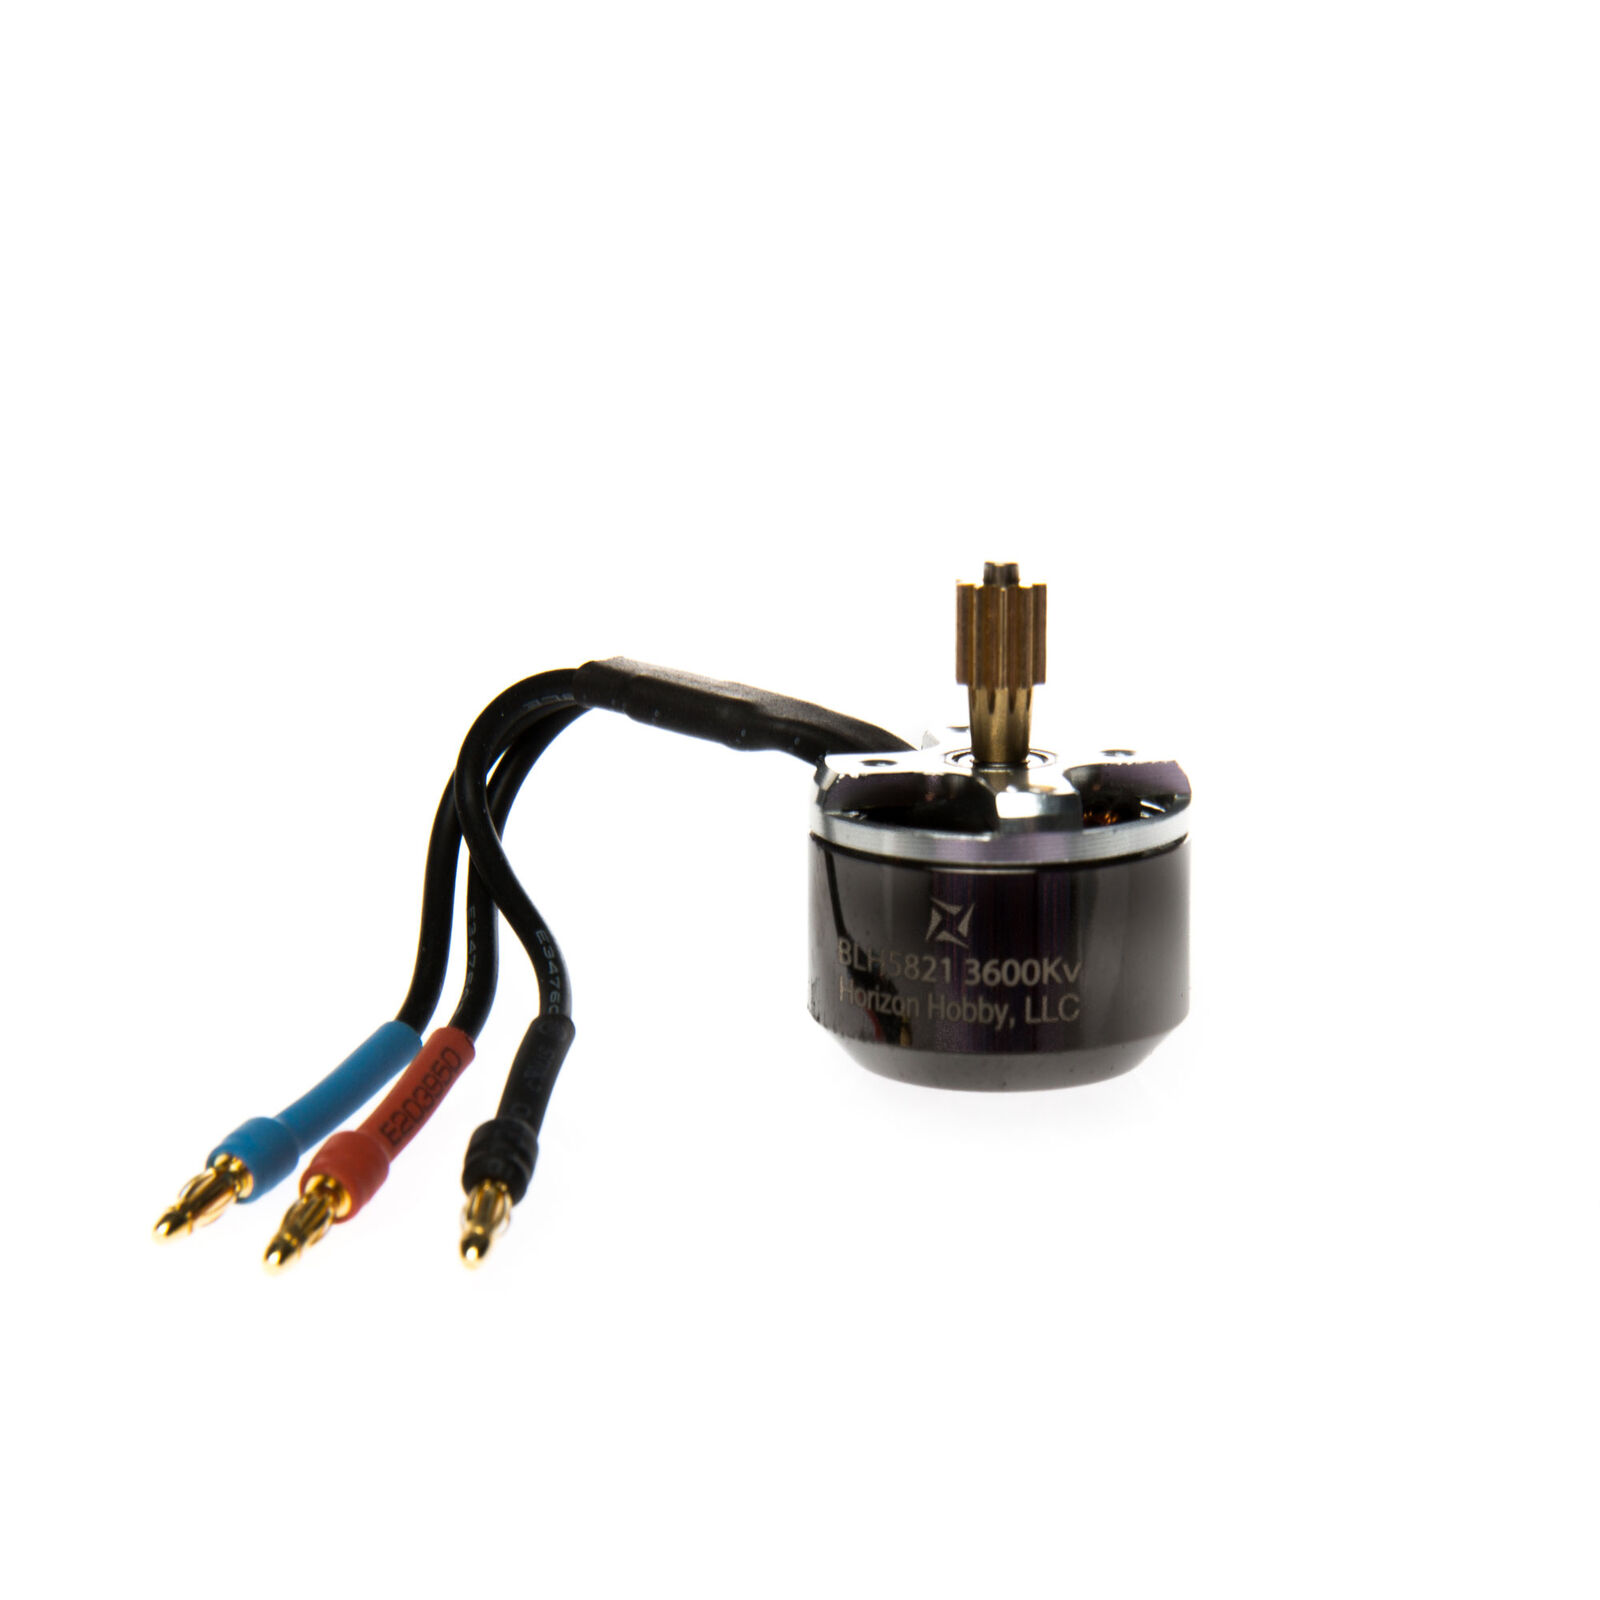 1310-3600Kv Brushless Motor: Fusion 180